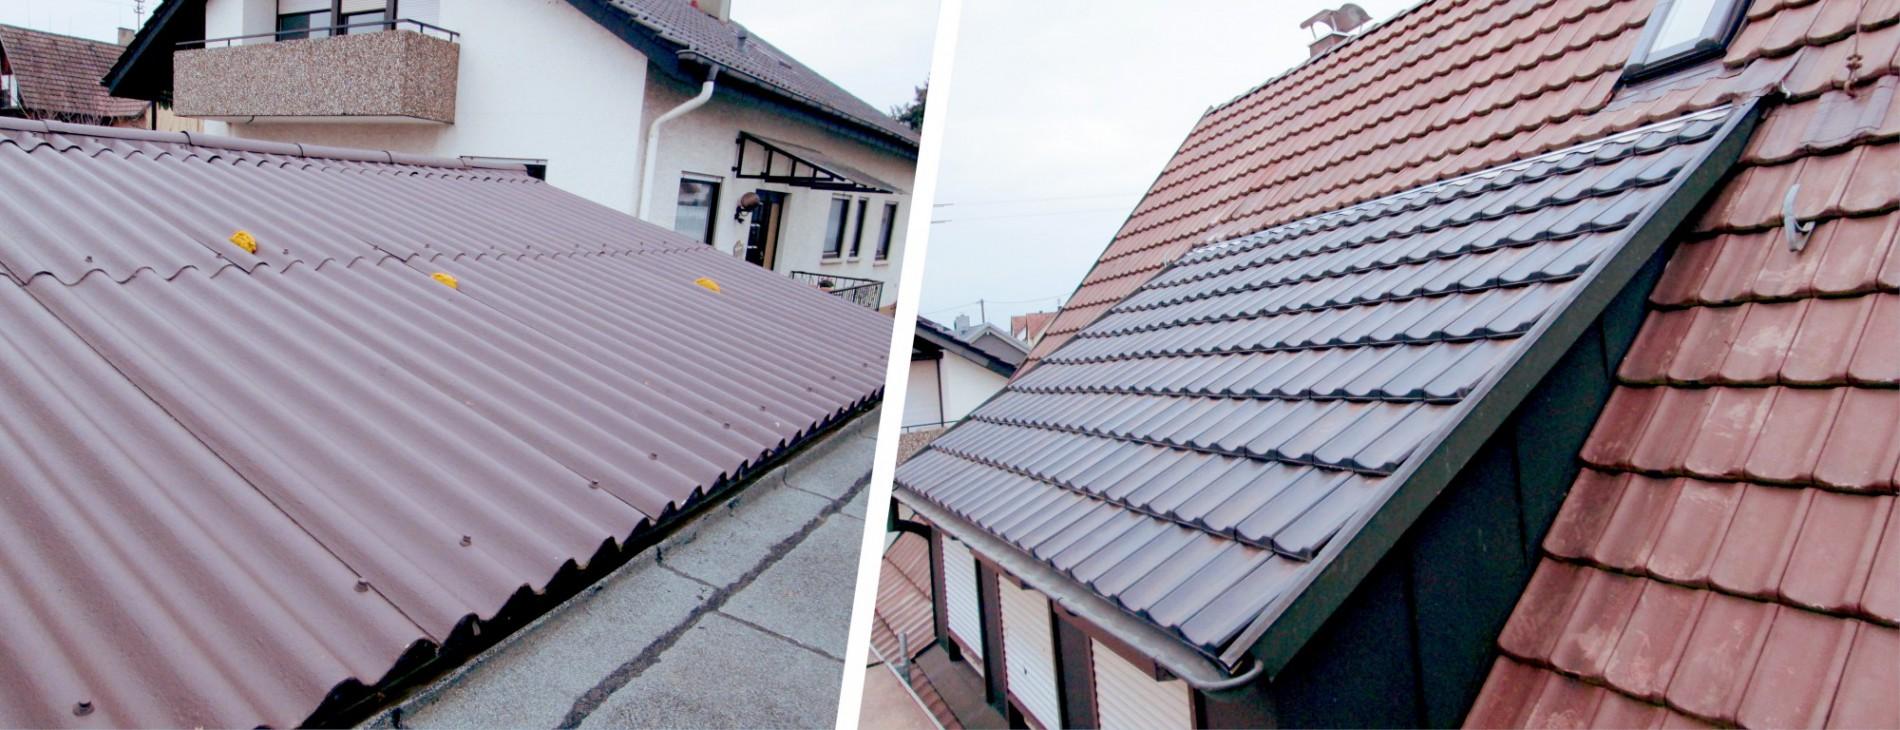 Dach-Ziegel05